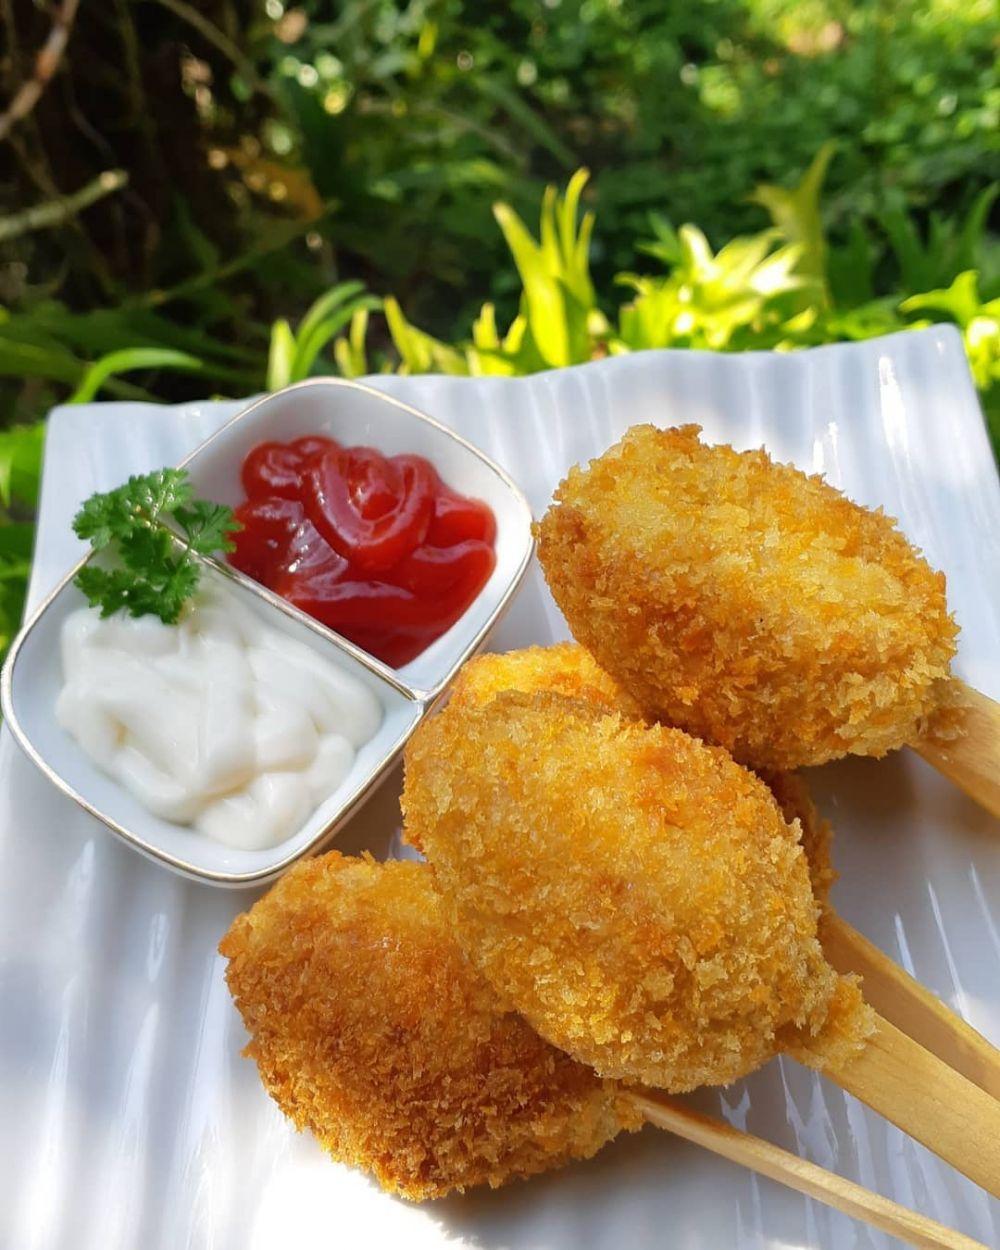 resep frozen food kaki naga